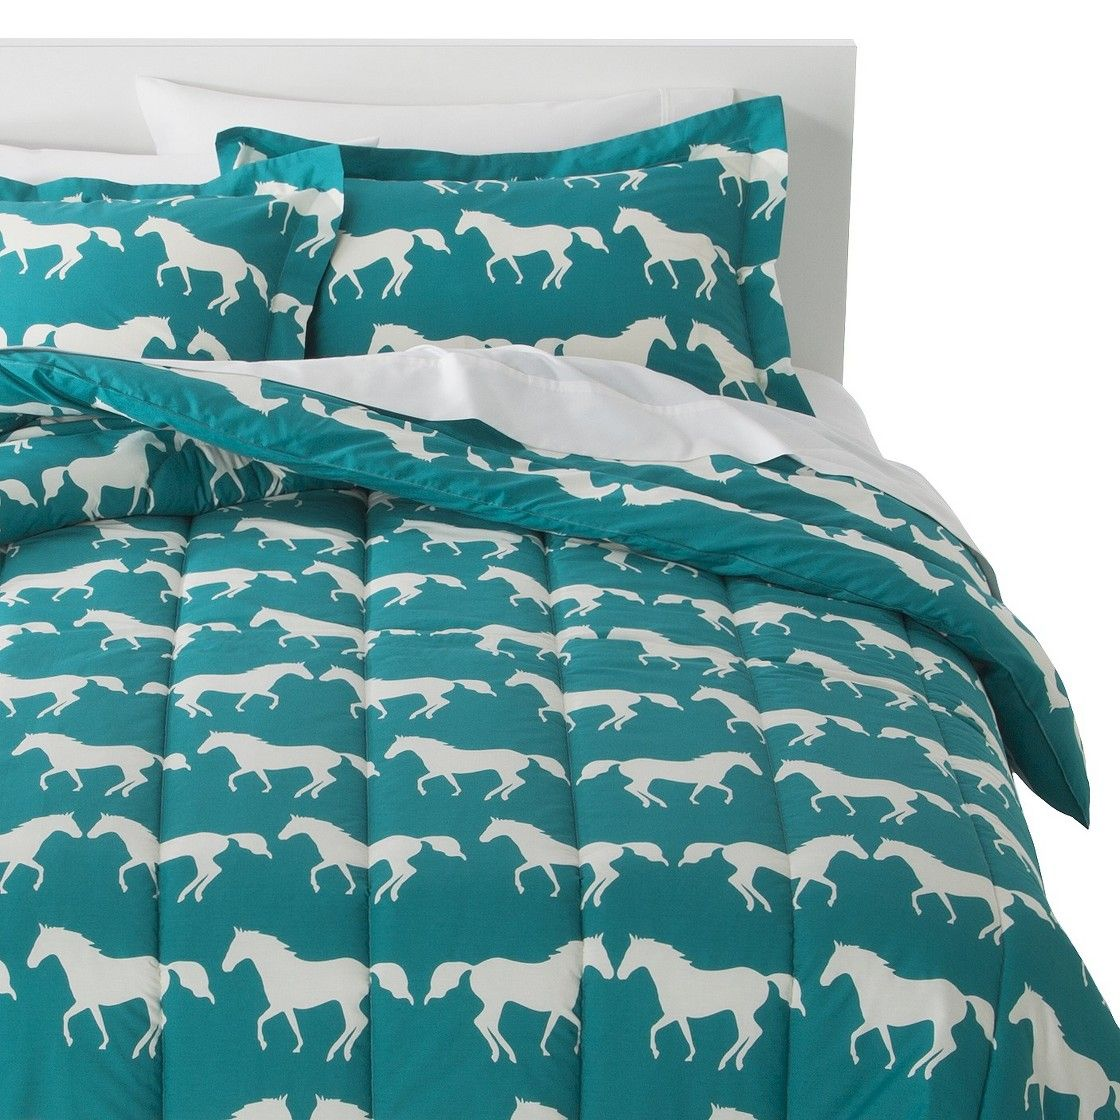 Anorak Horses Comforter Set   Blue White. Anorak Horses Comforter Set   Blue White   Creative ideas